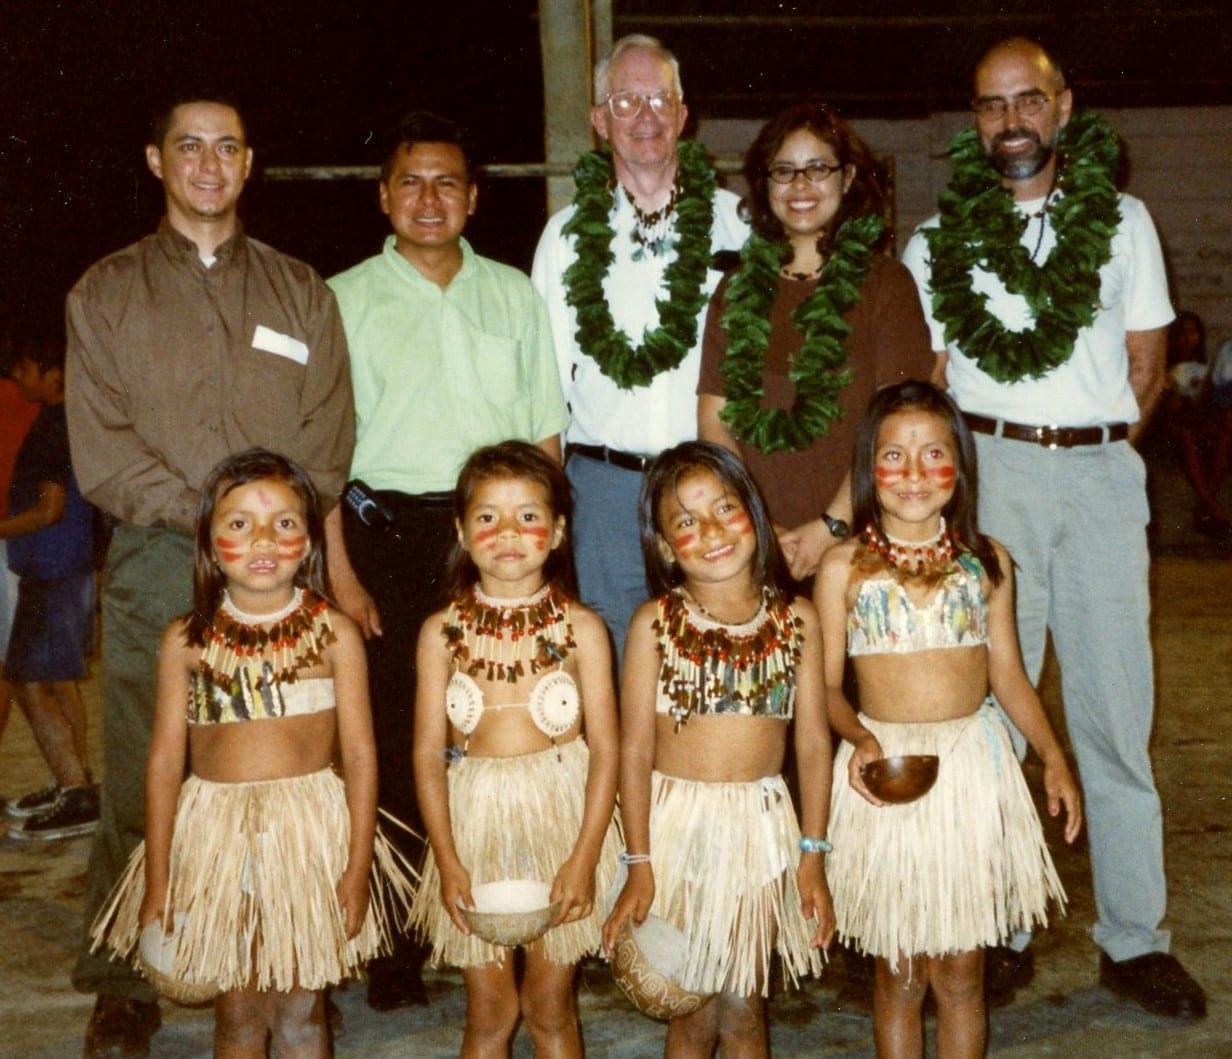 adventures-Tena, Ecuador officials and children welcome Santa Clarita Sister City visitors Carl Boyer, Elena Galvez and Ken Pulskamp in 2001.